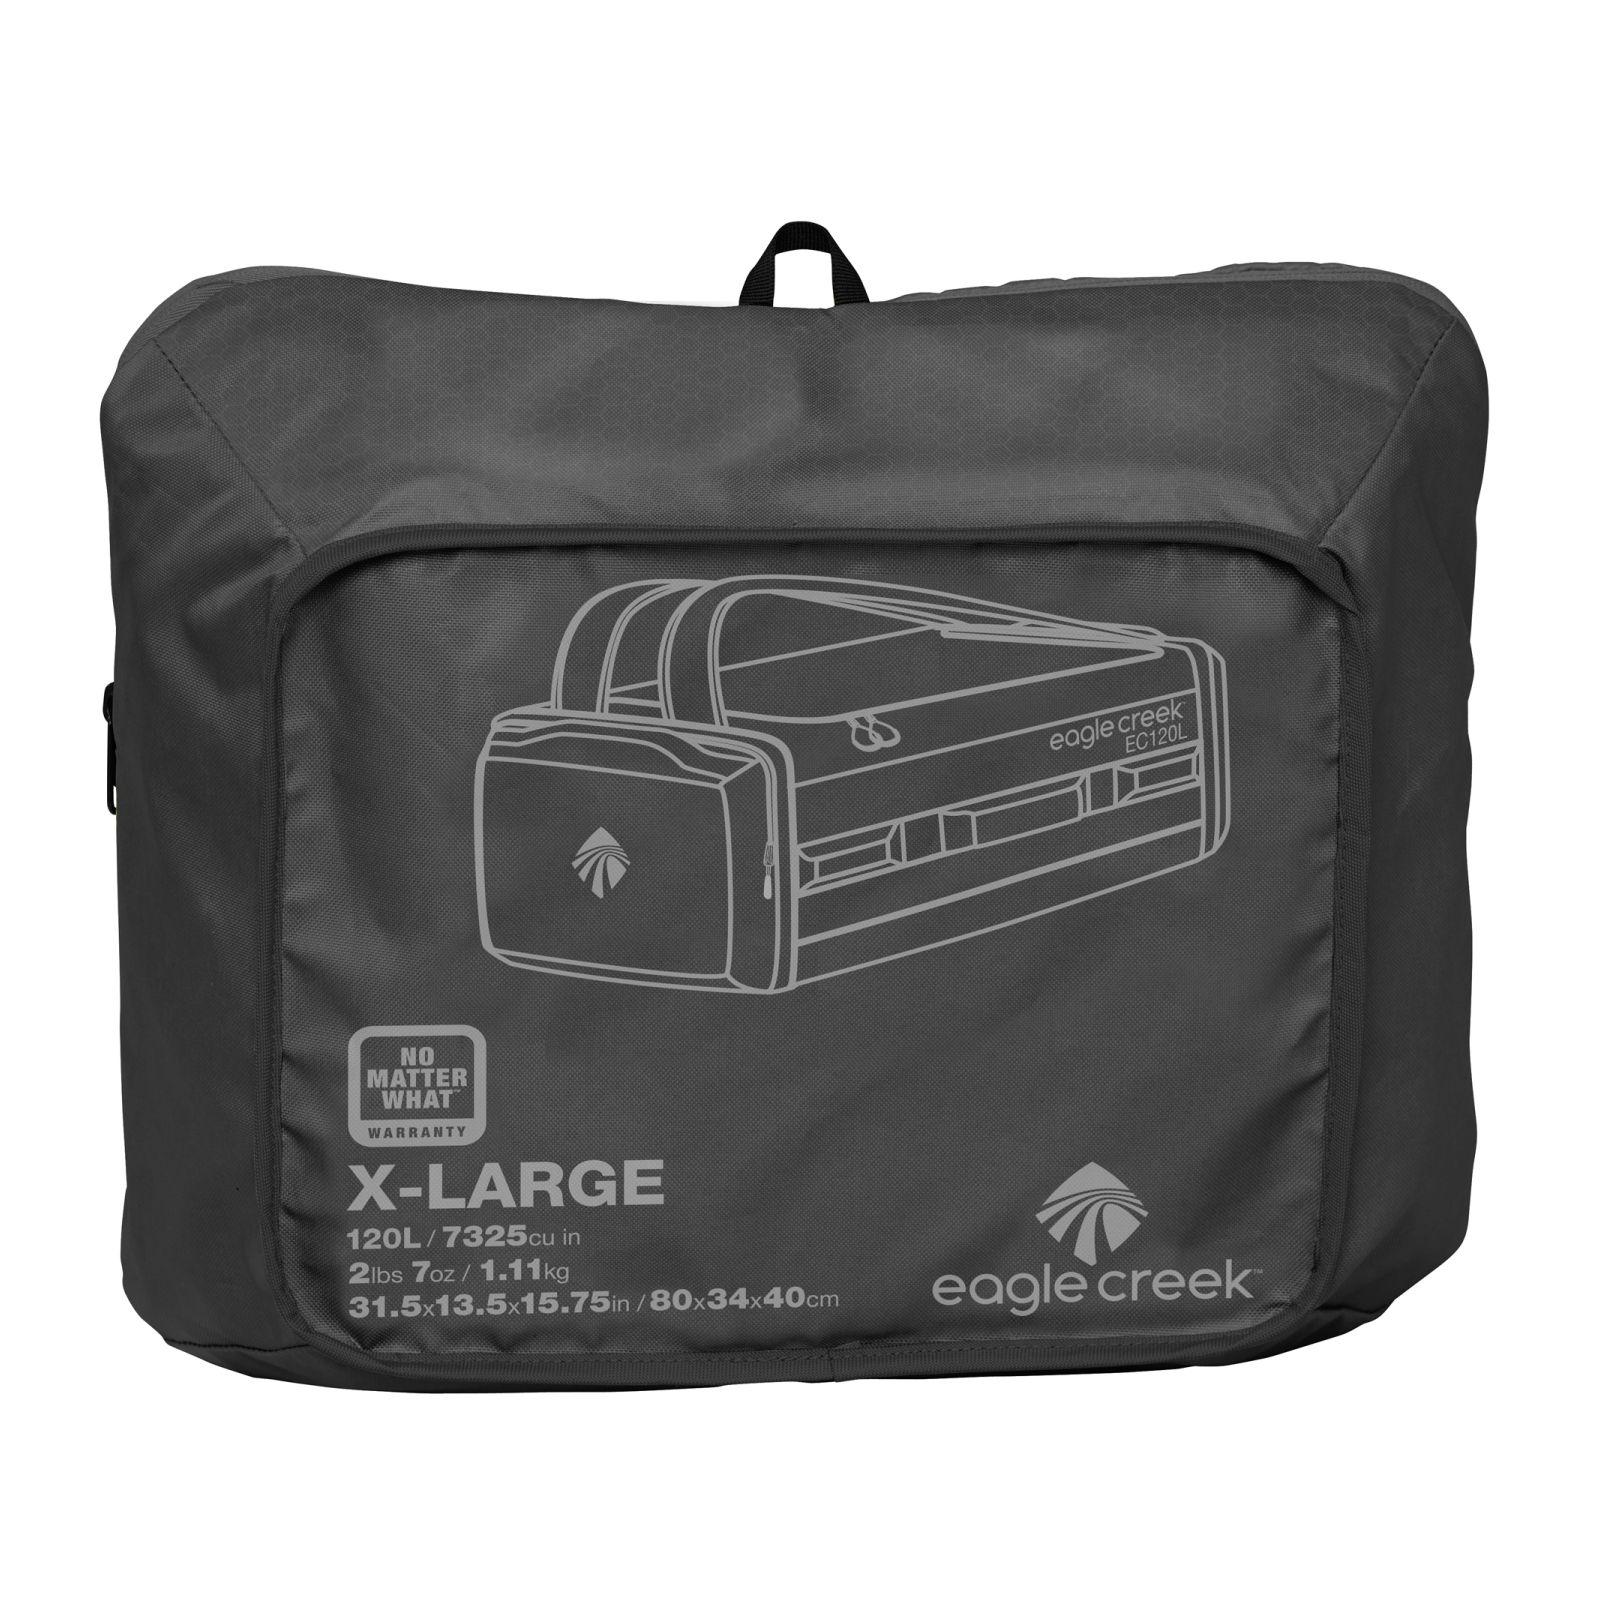 Buy Eagle Creek Cargo Hauler Duffel 120L   Xl(Black) in Singapore ... 6340582974